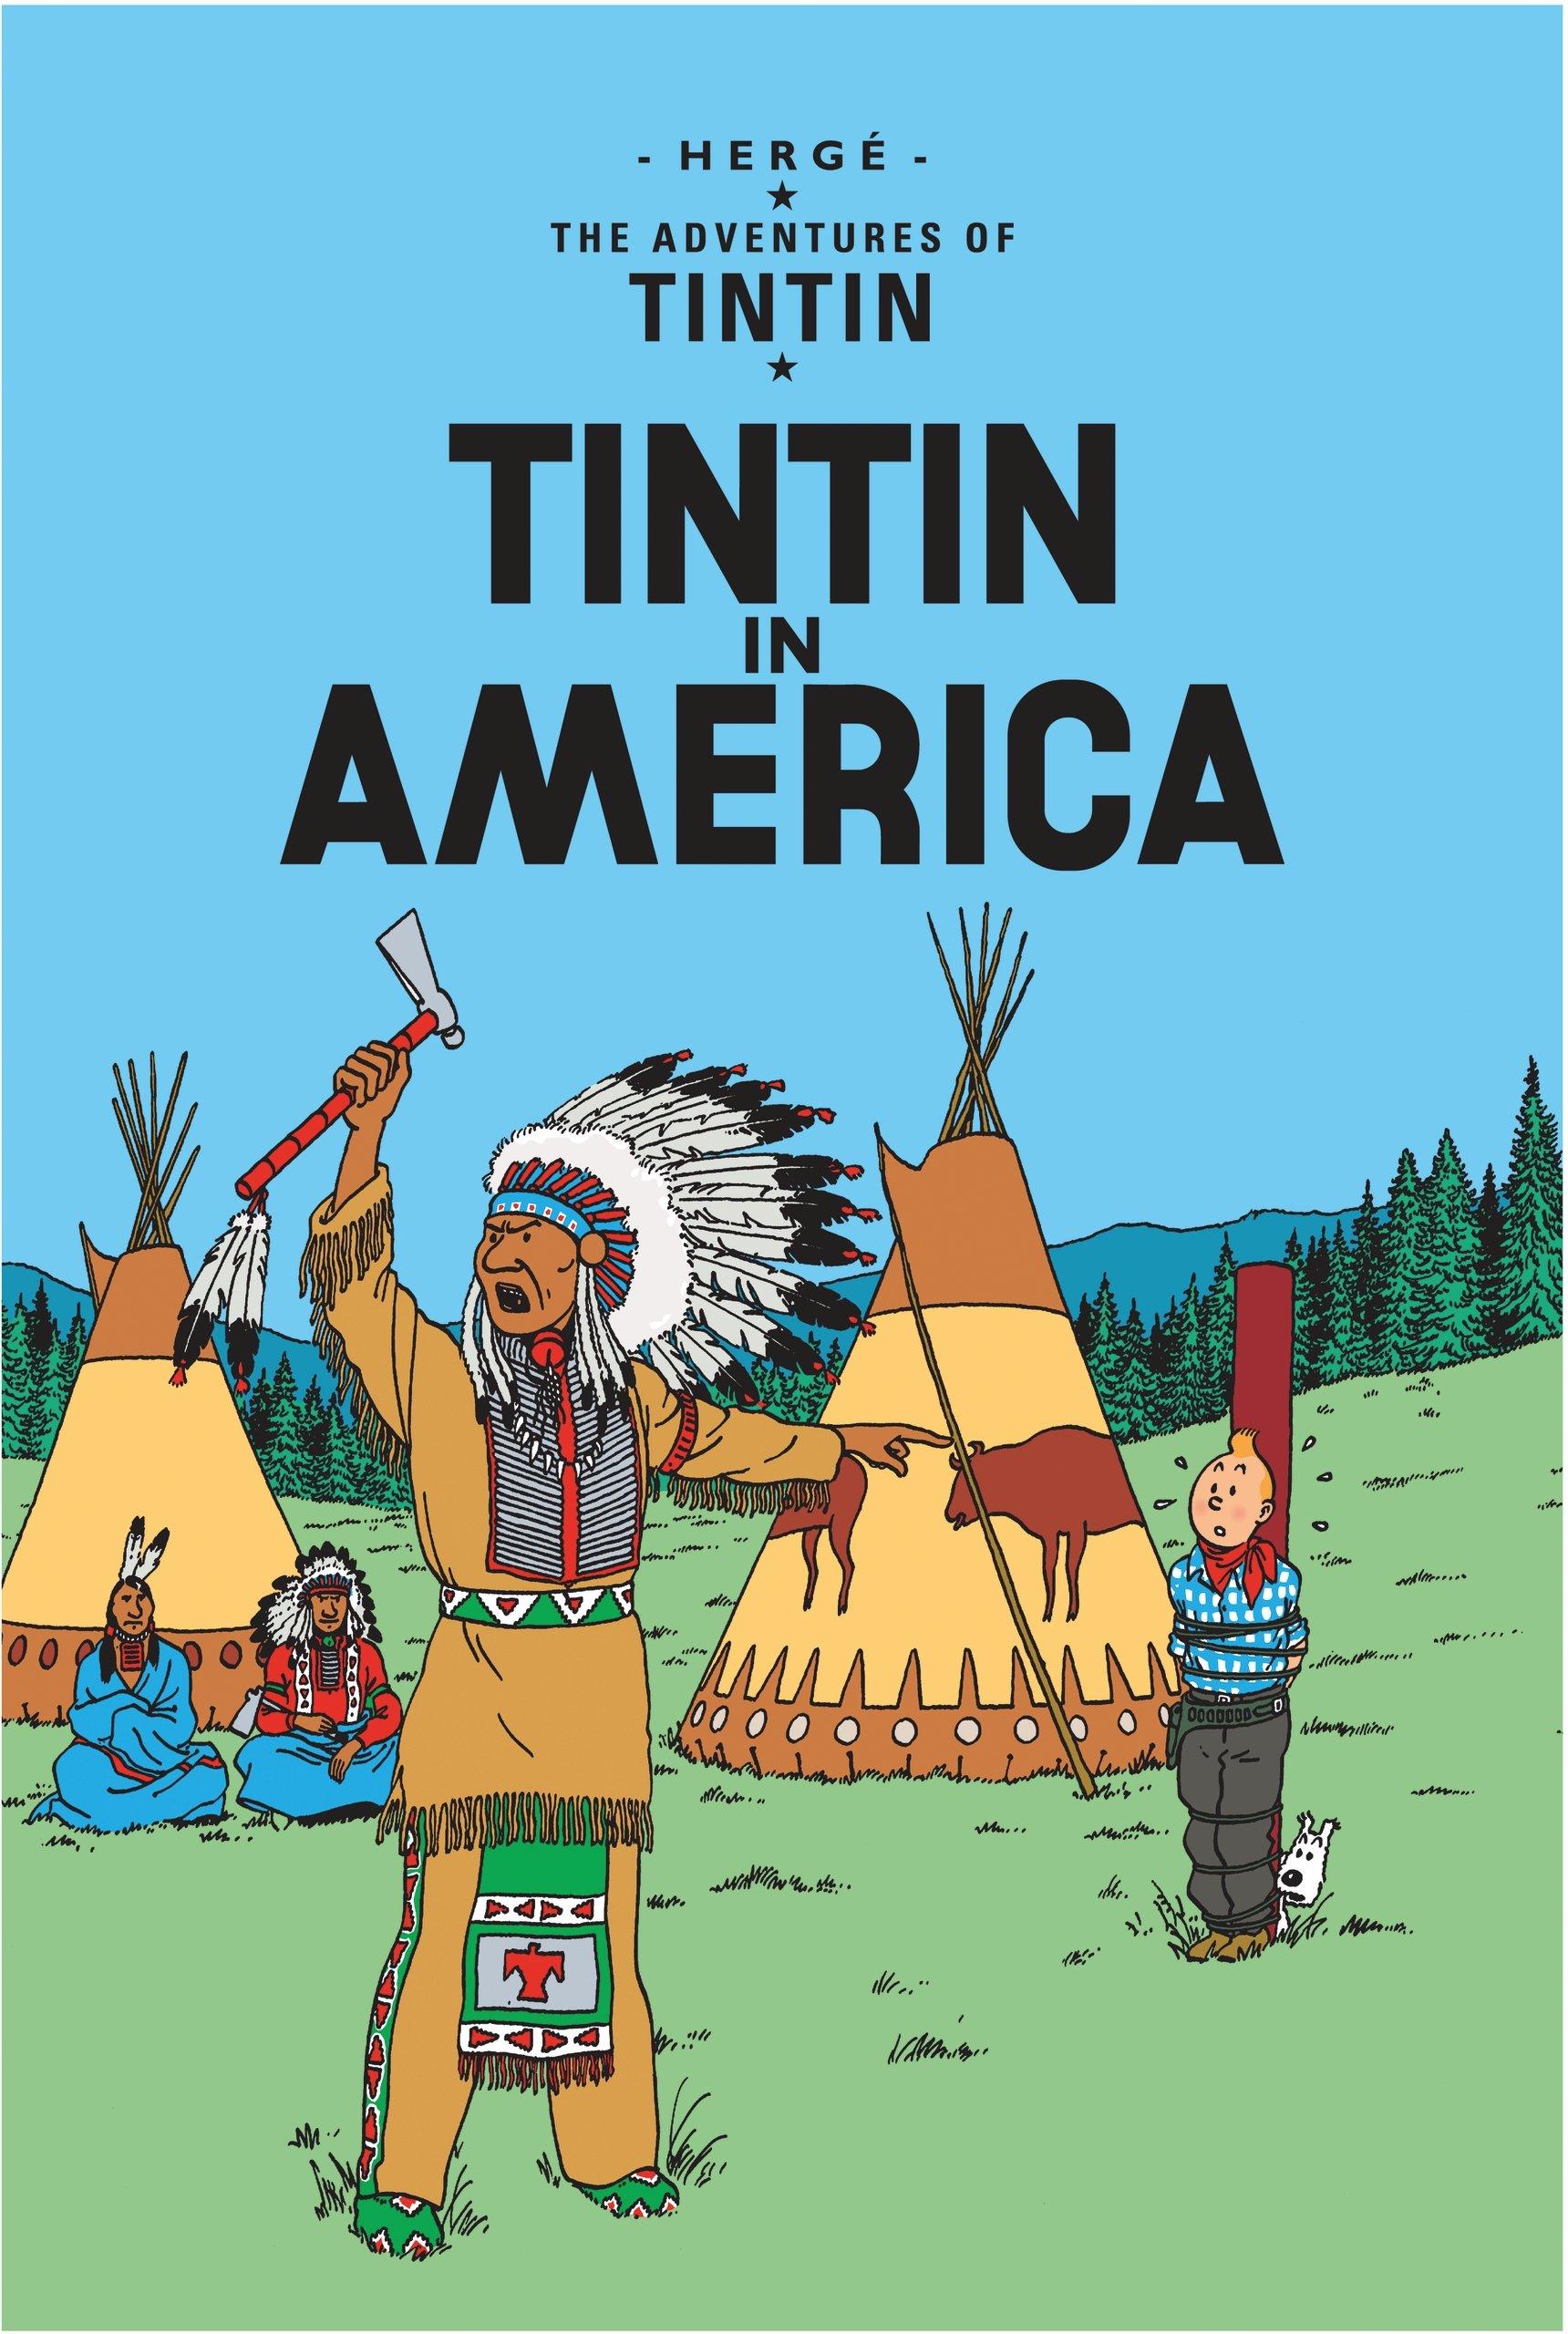 tintin in america adventures of tintin paperback